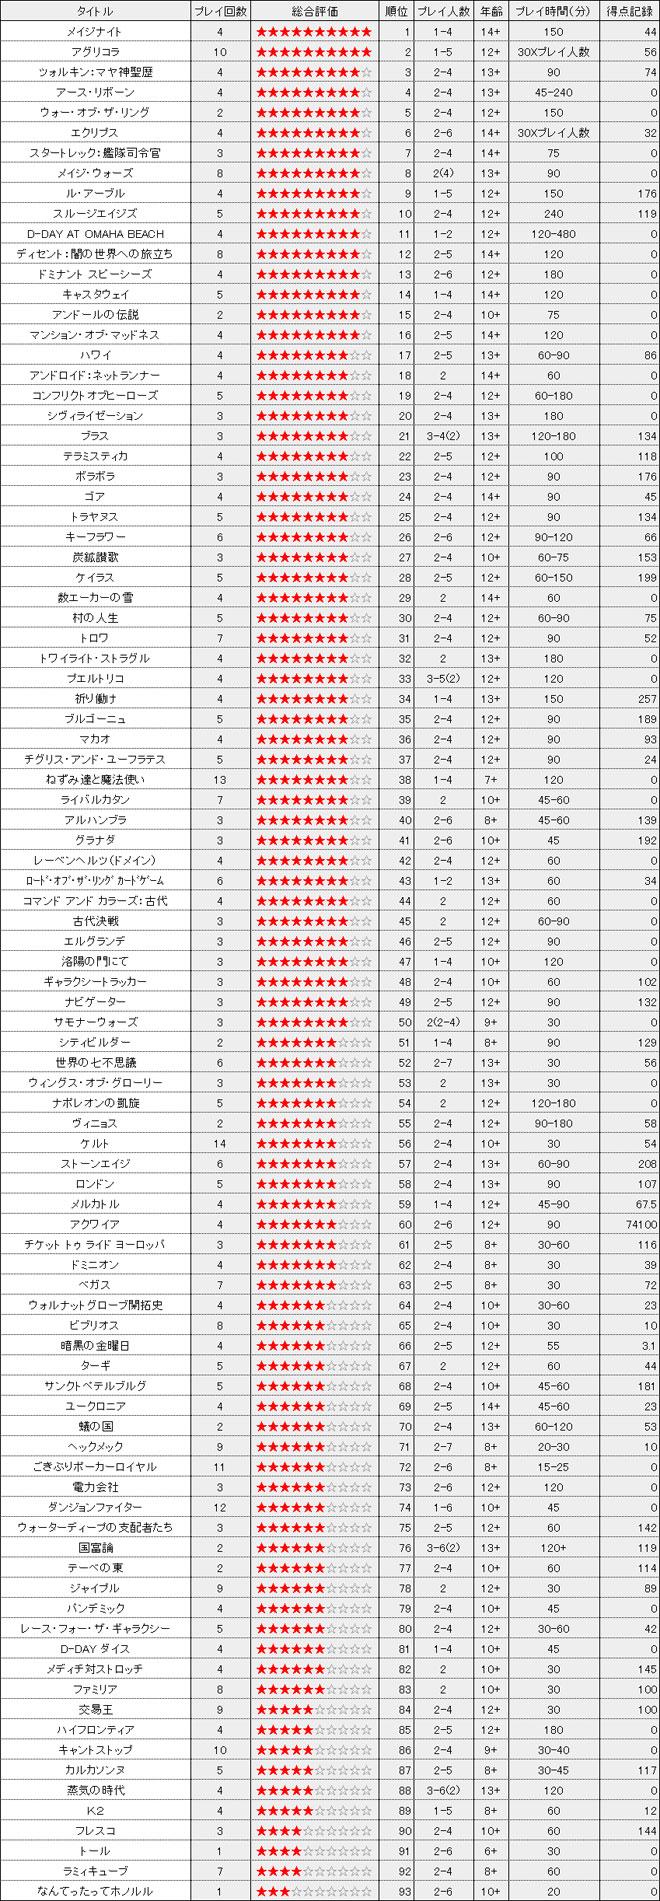 ranking140101_01.jpg